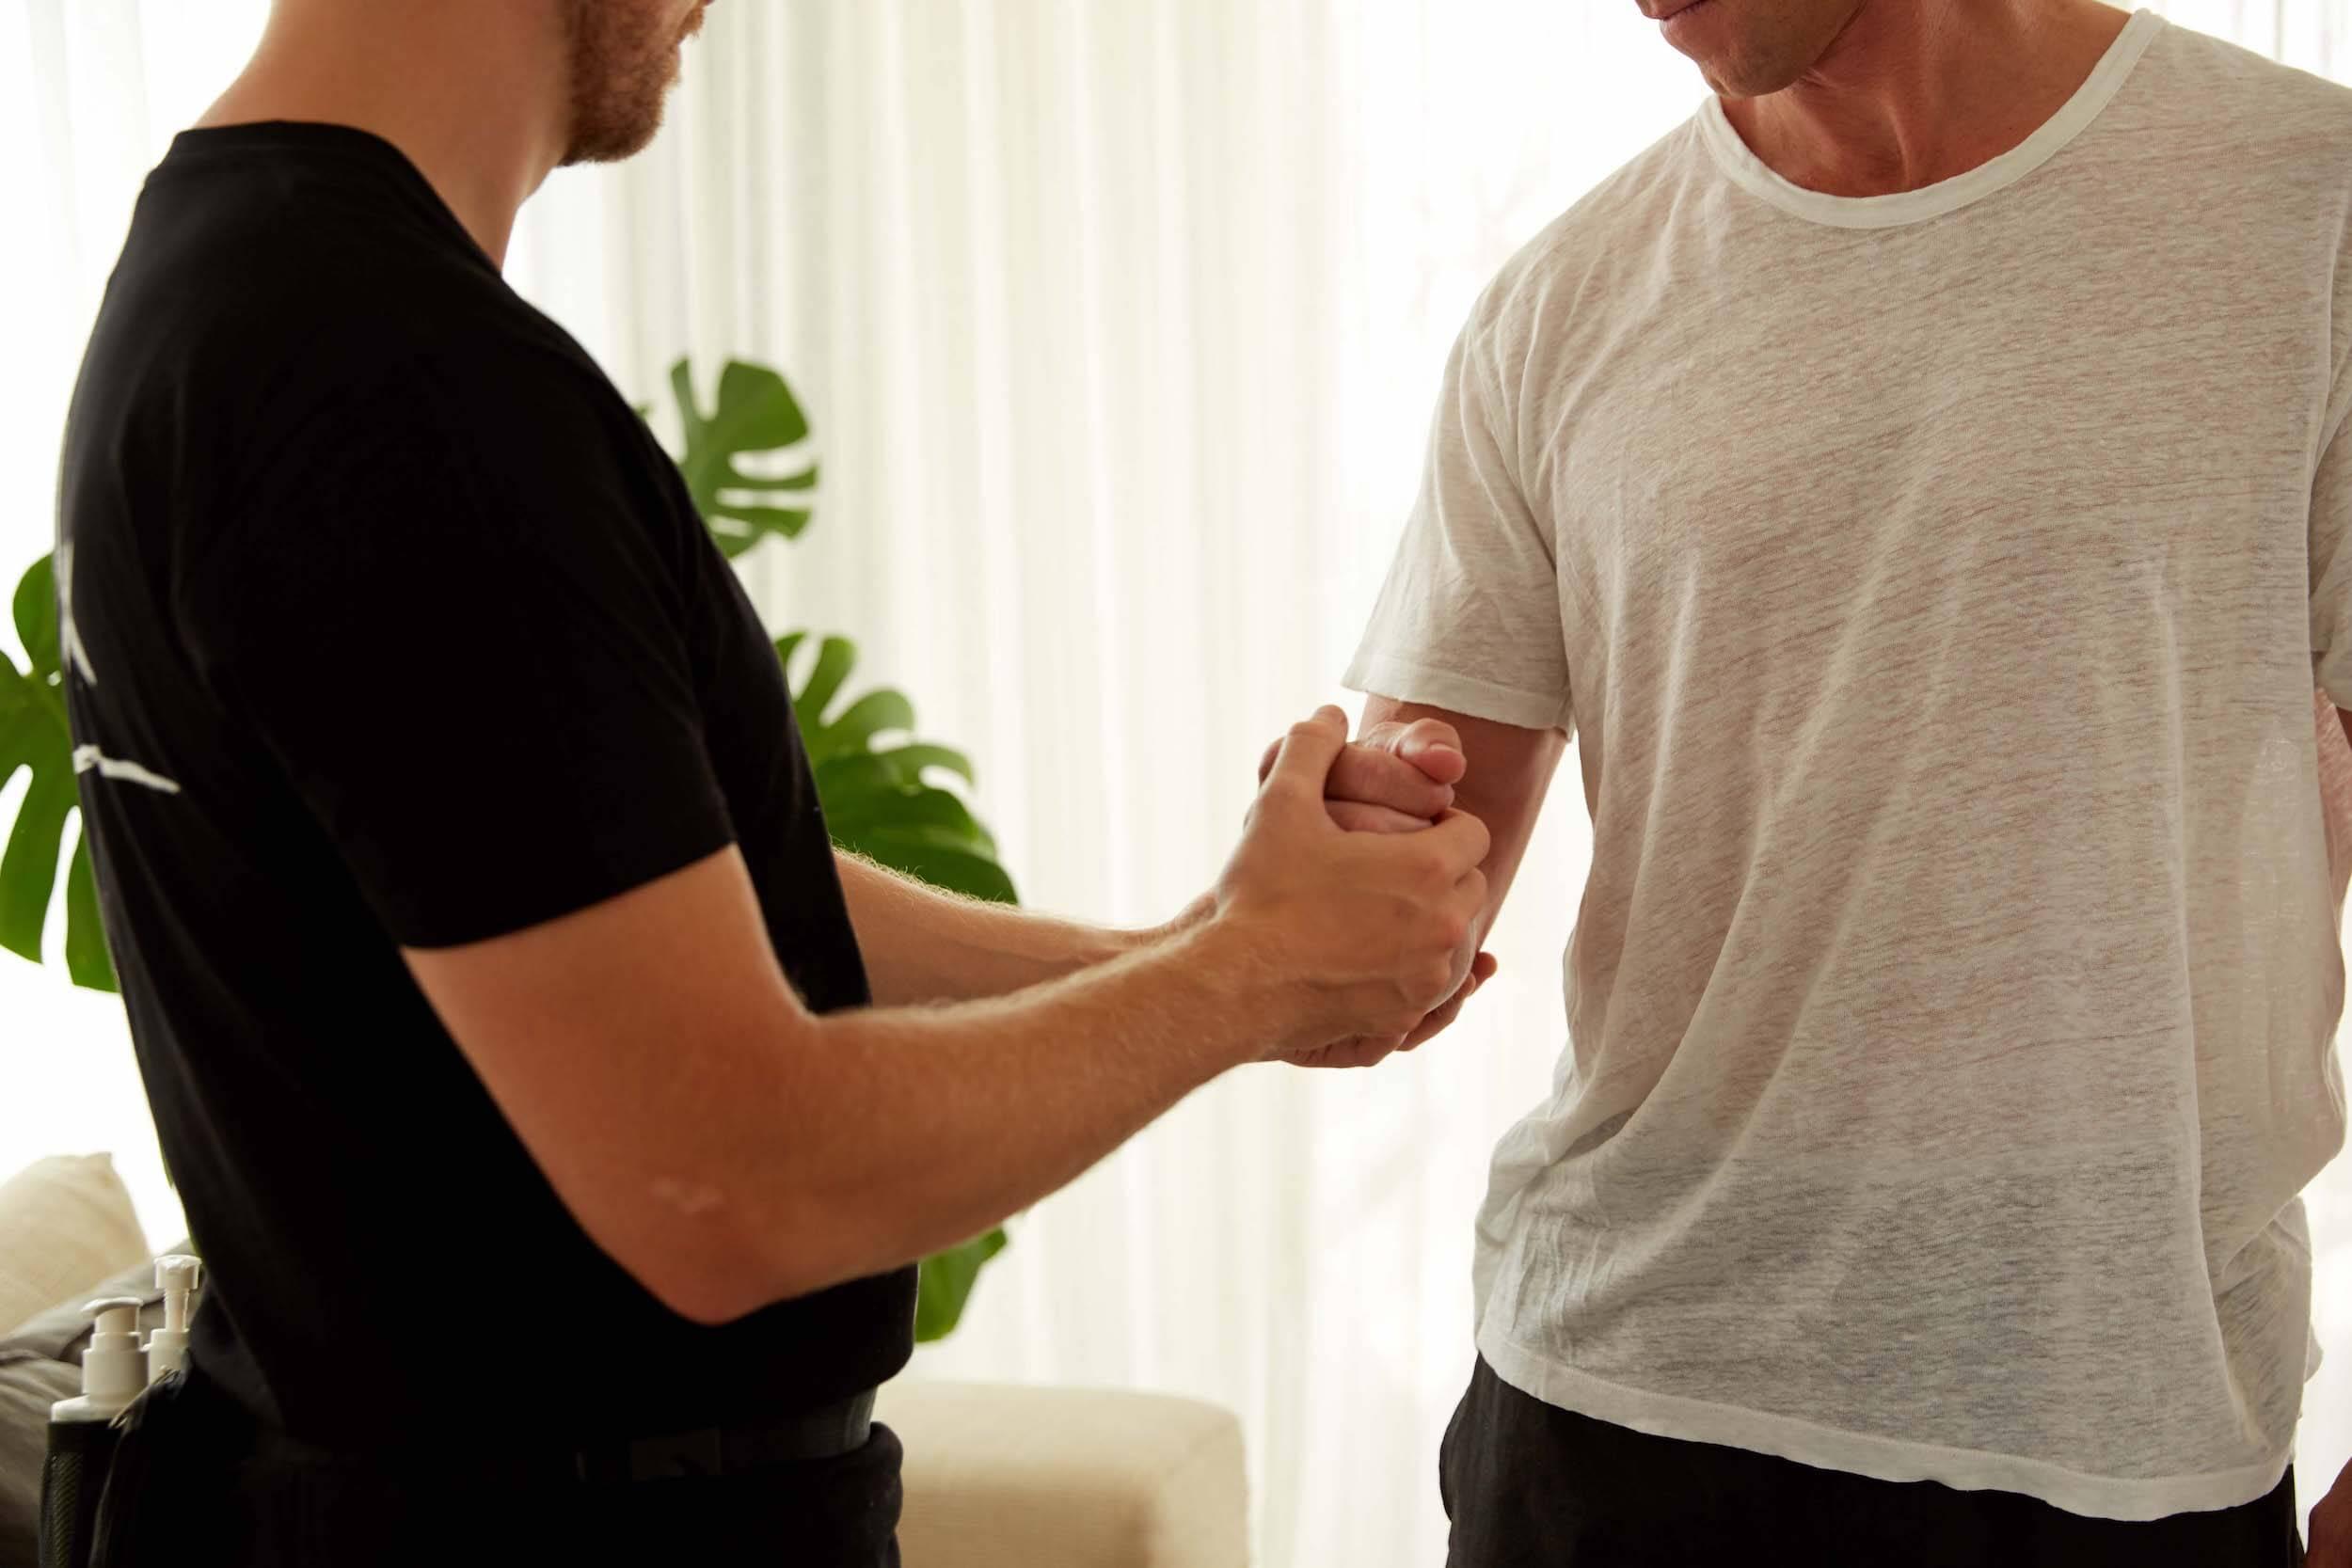 Physio examining client's arm